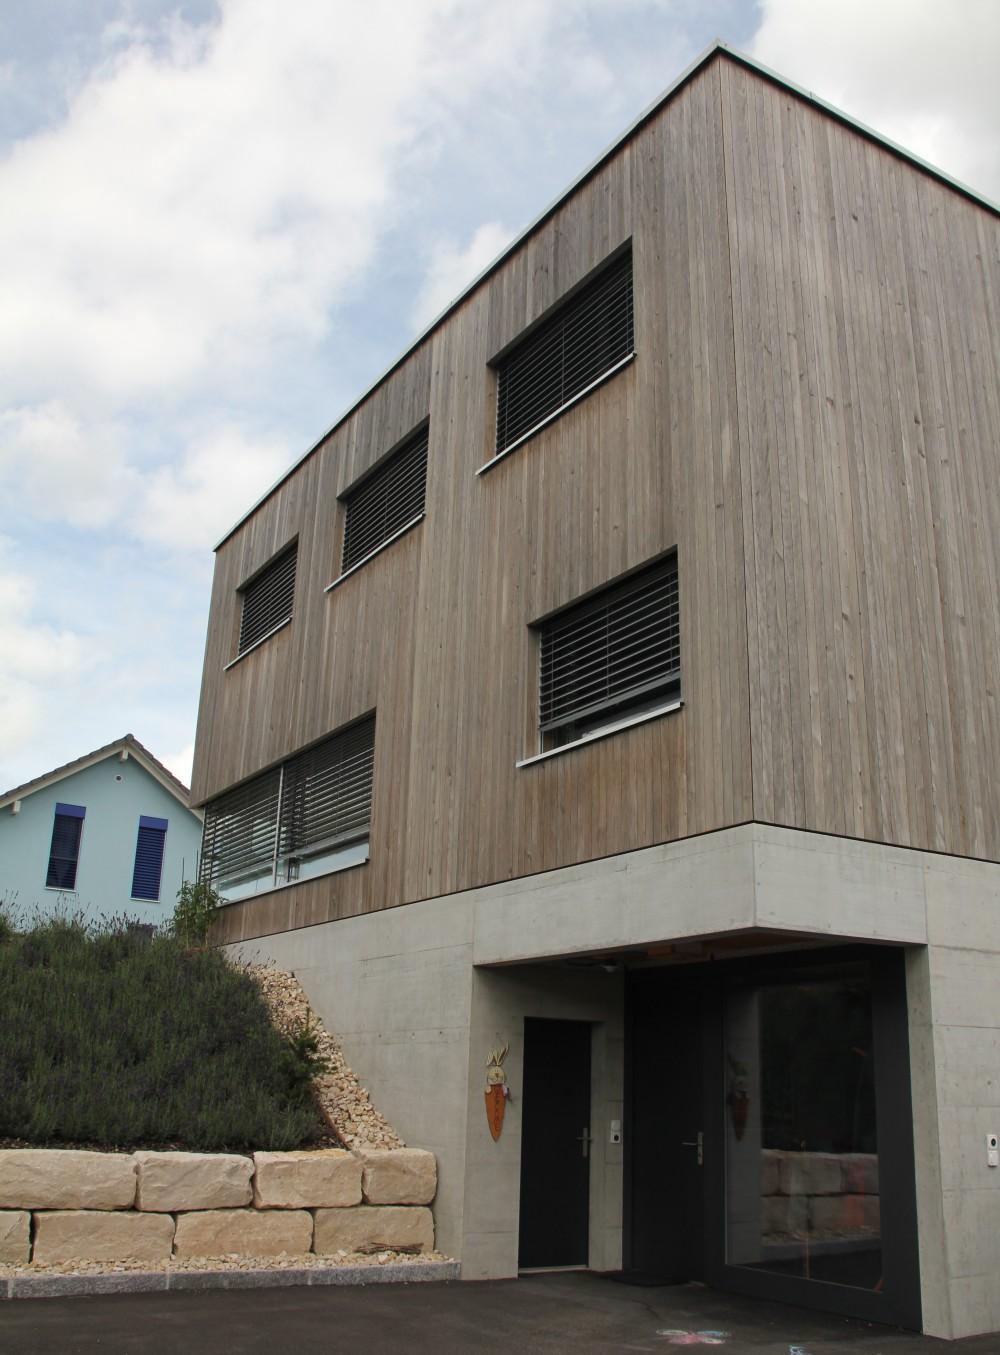 Villa-a-malleray-125-943-4